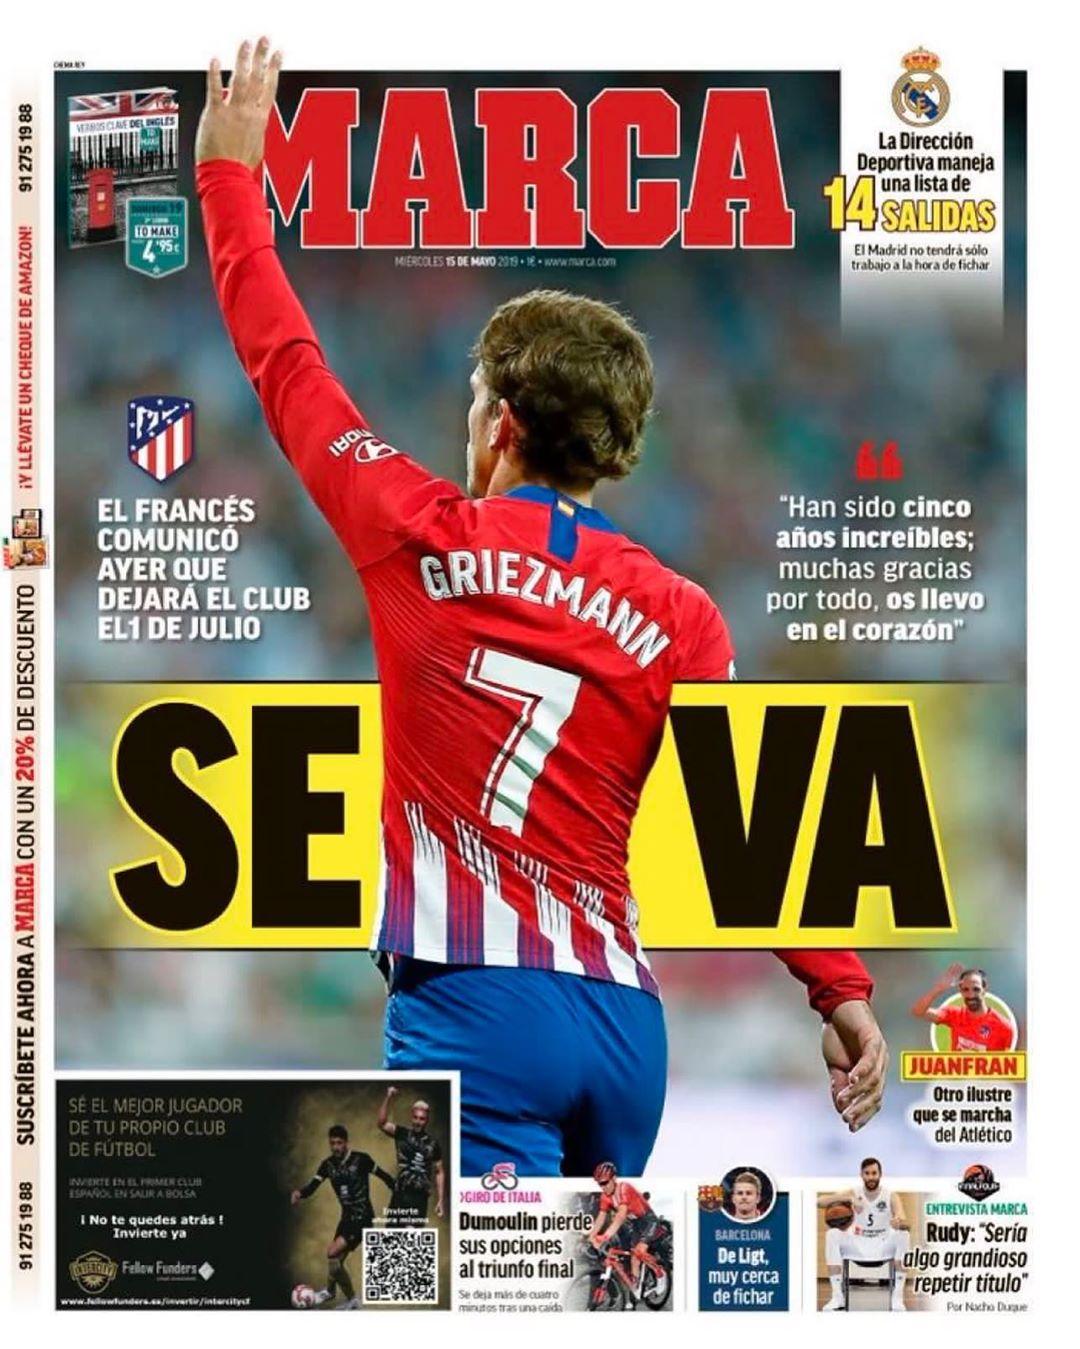 الماركا: غريزمانغغادر 0 0 0 0 0 #Realmadrid #benzema #zidane #cristiano #serg …